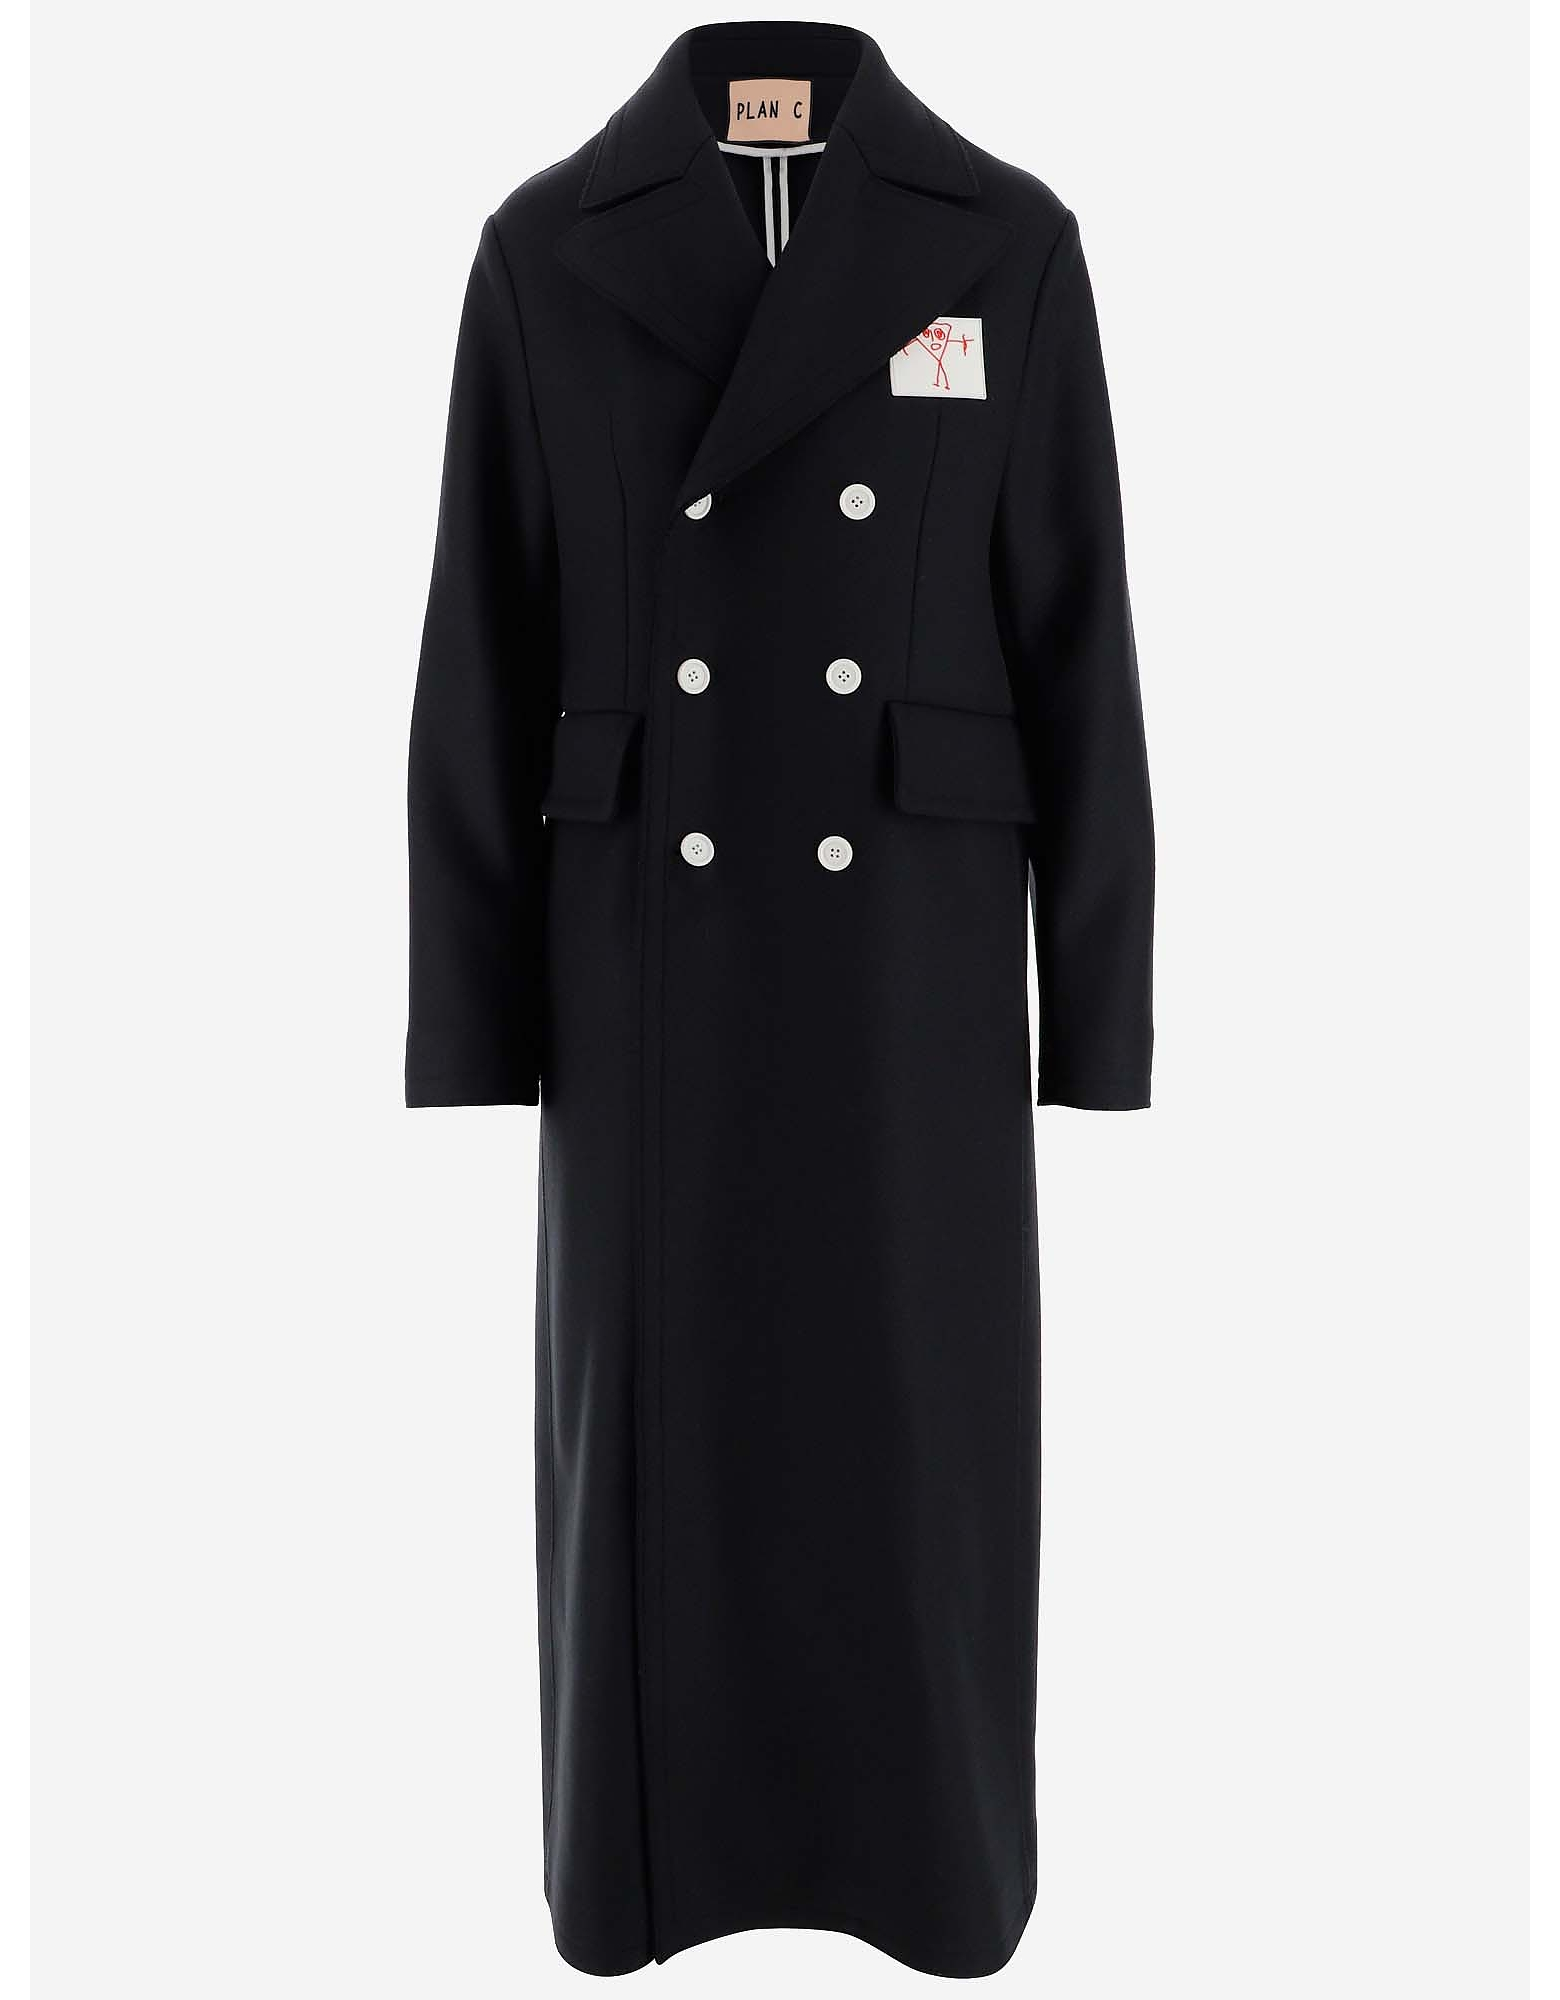 Plan C Designer Coats & Jackets, Dark blue Wool Double-breasted Overcoa